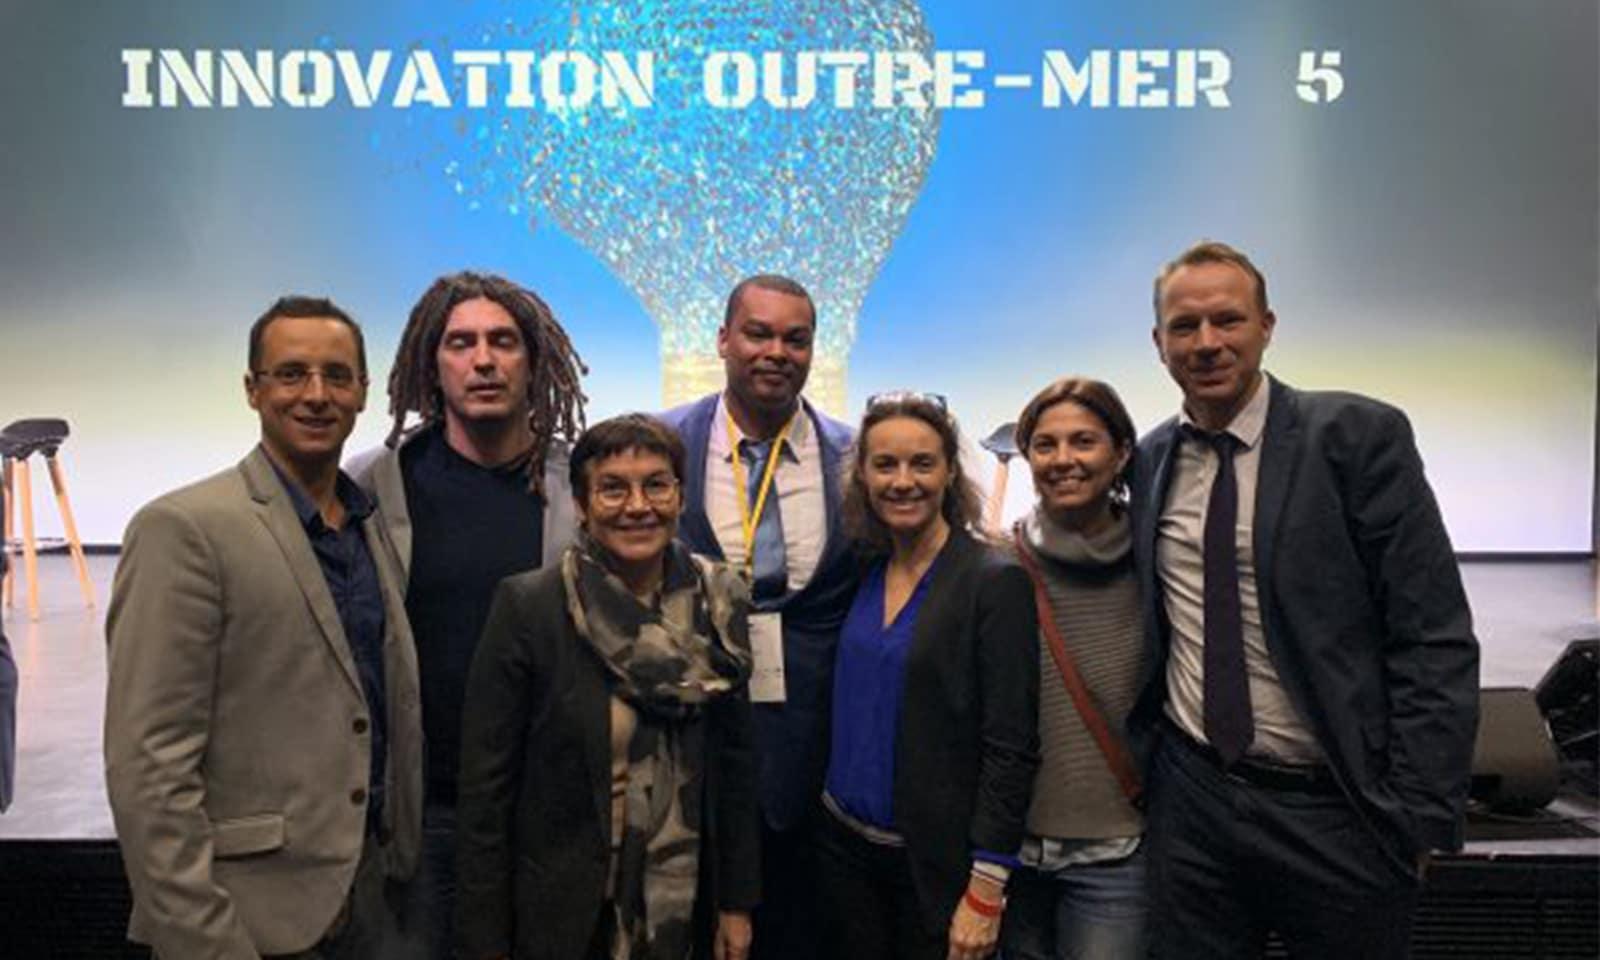 Innovation-Outre-Mer